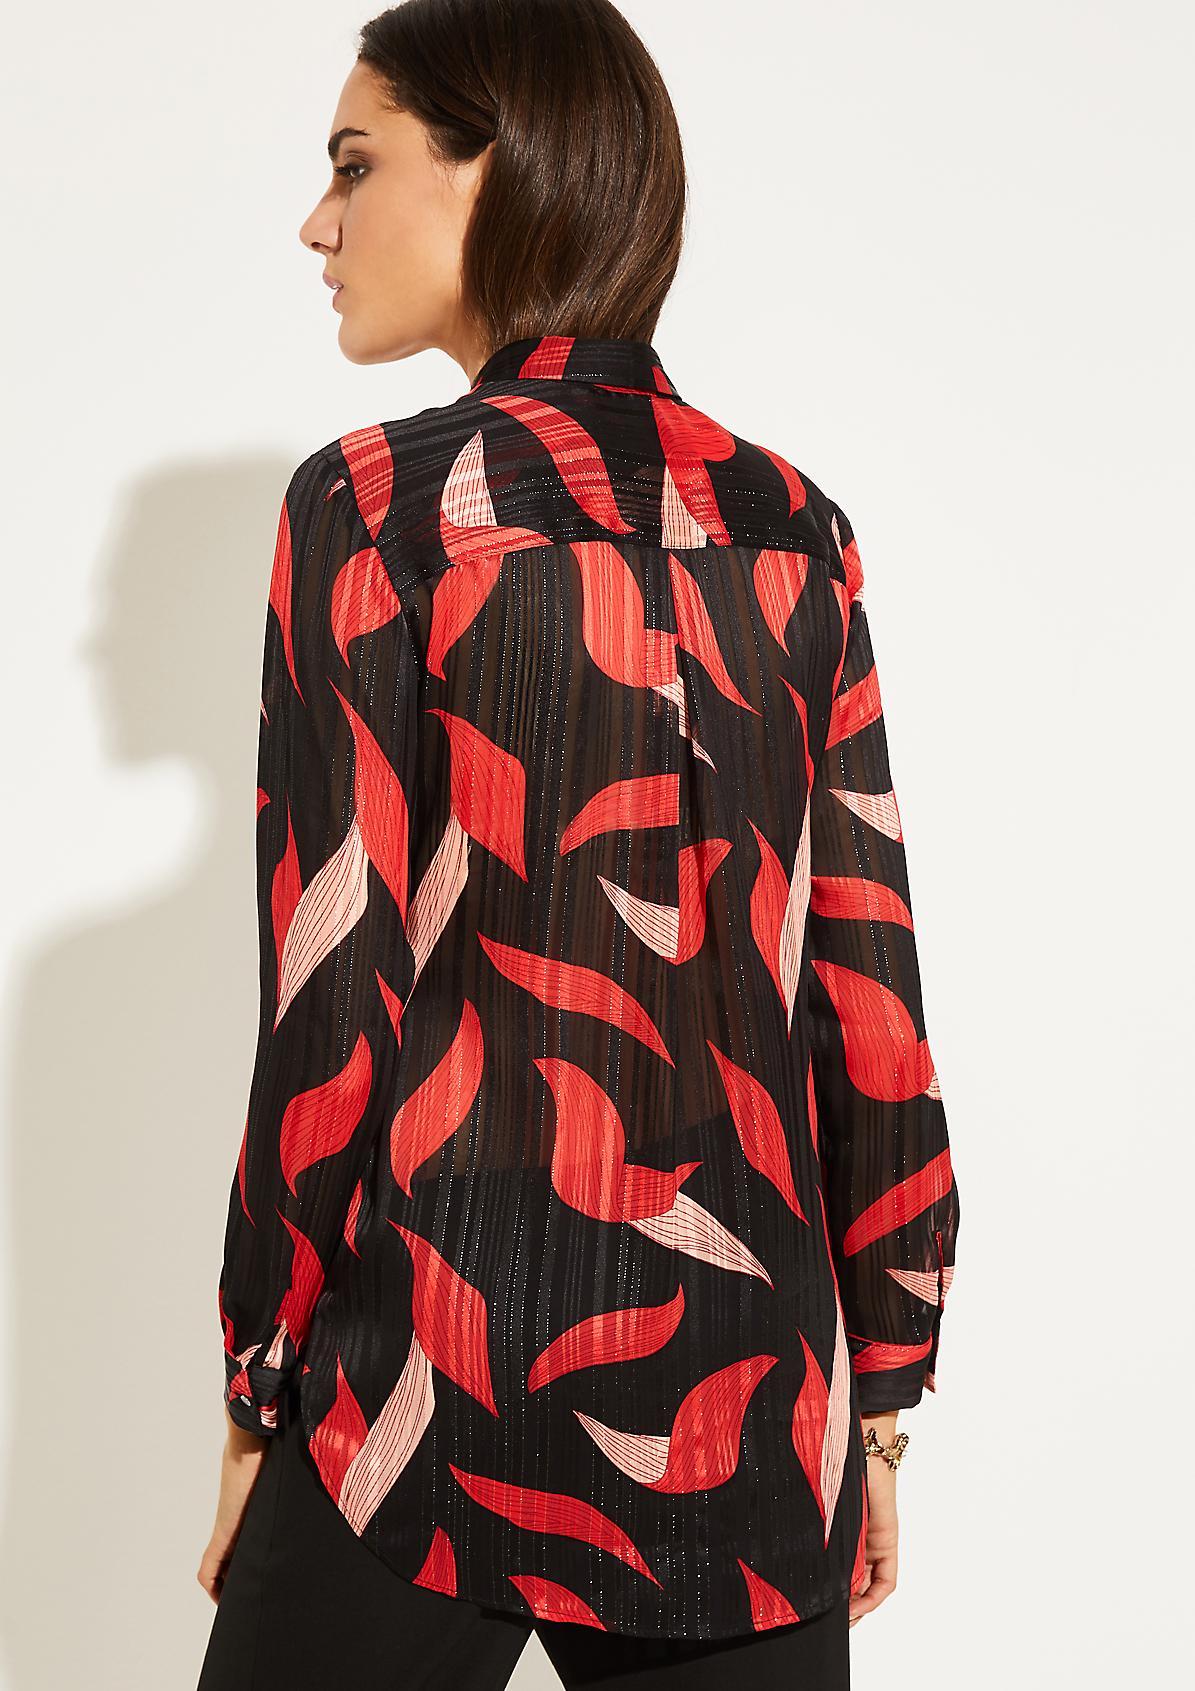 Zarte Langarmbluse mit farbenprächtigem Alloverprint